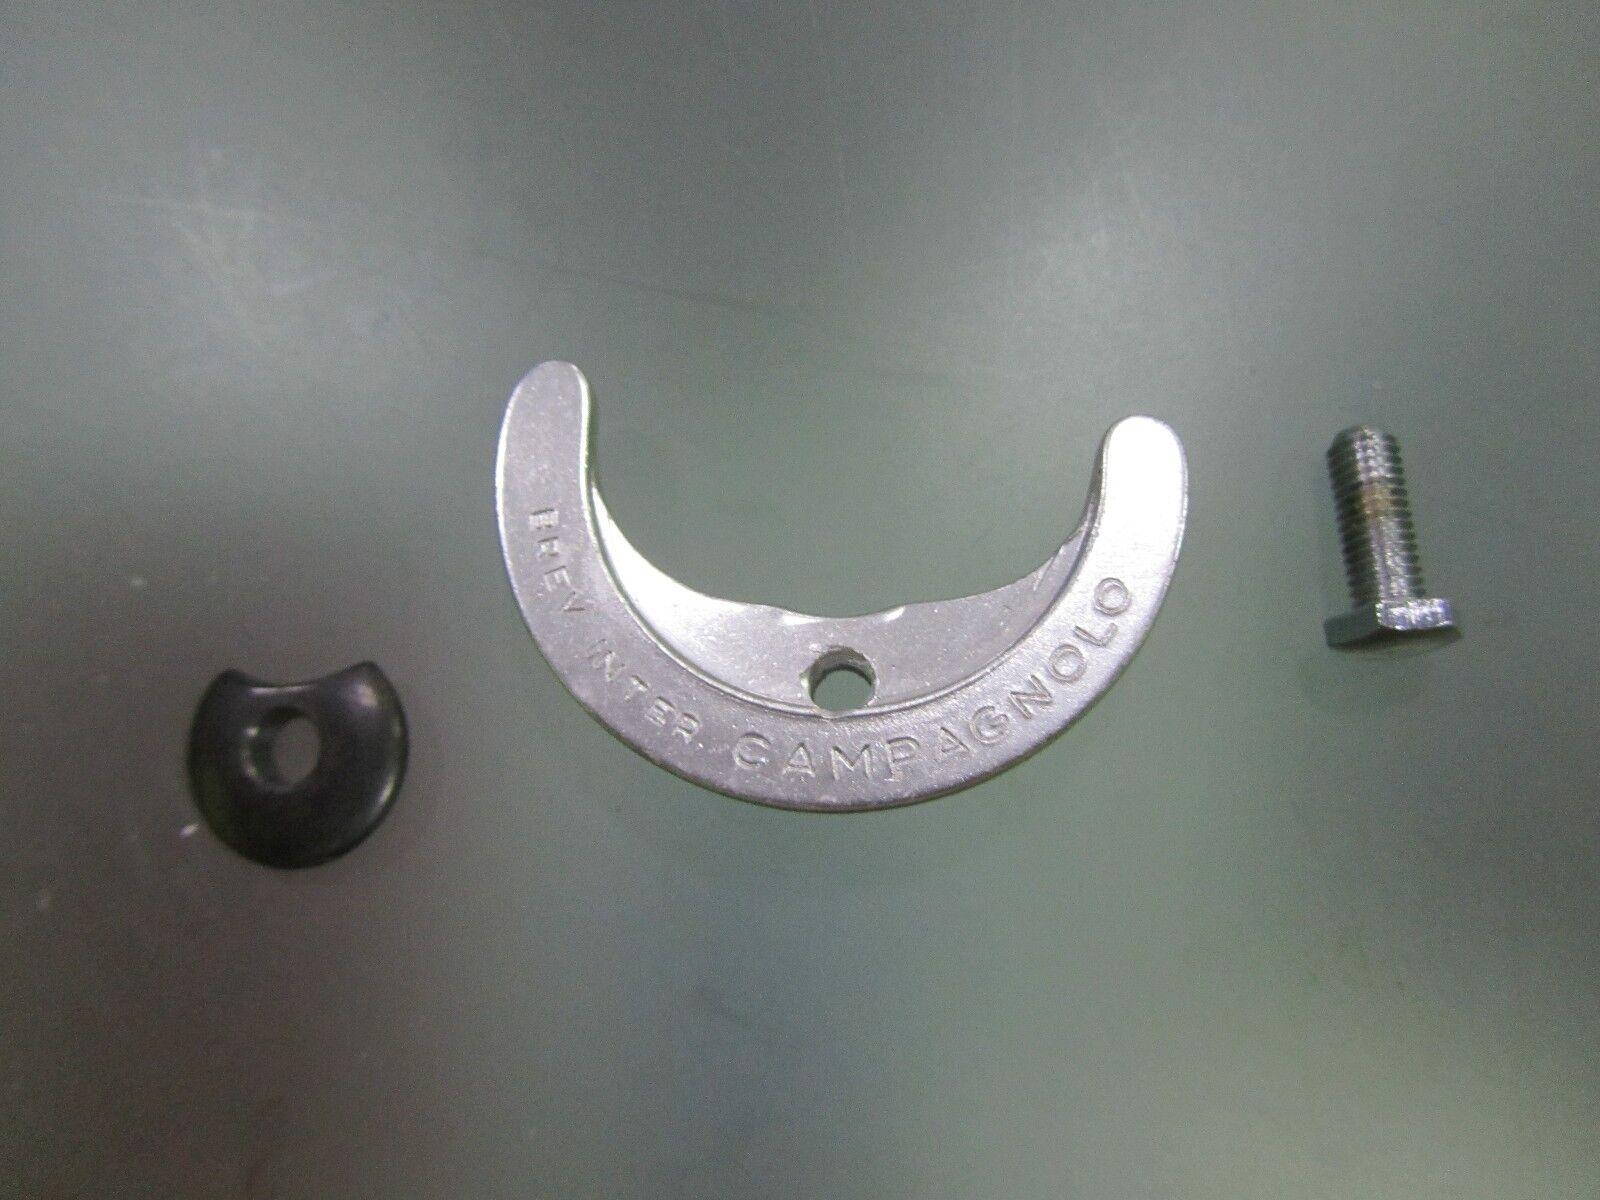 Campagnolo Chain Holder Porta Catena Dropout Vintage Bike Portacatena  NOS  official authorization